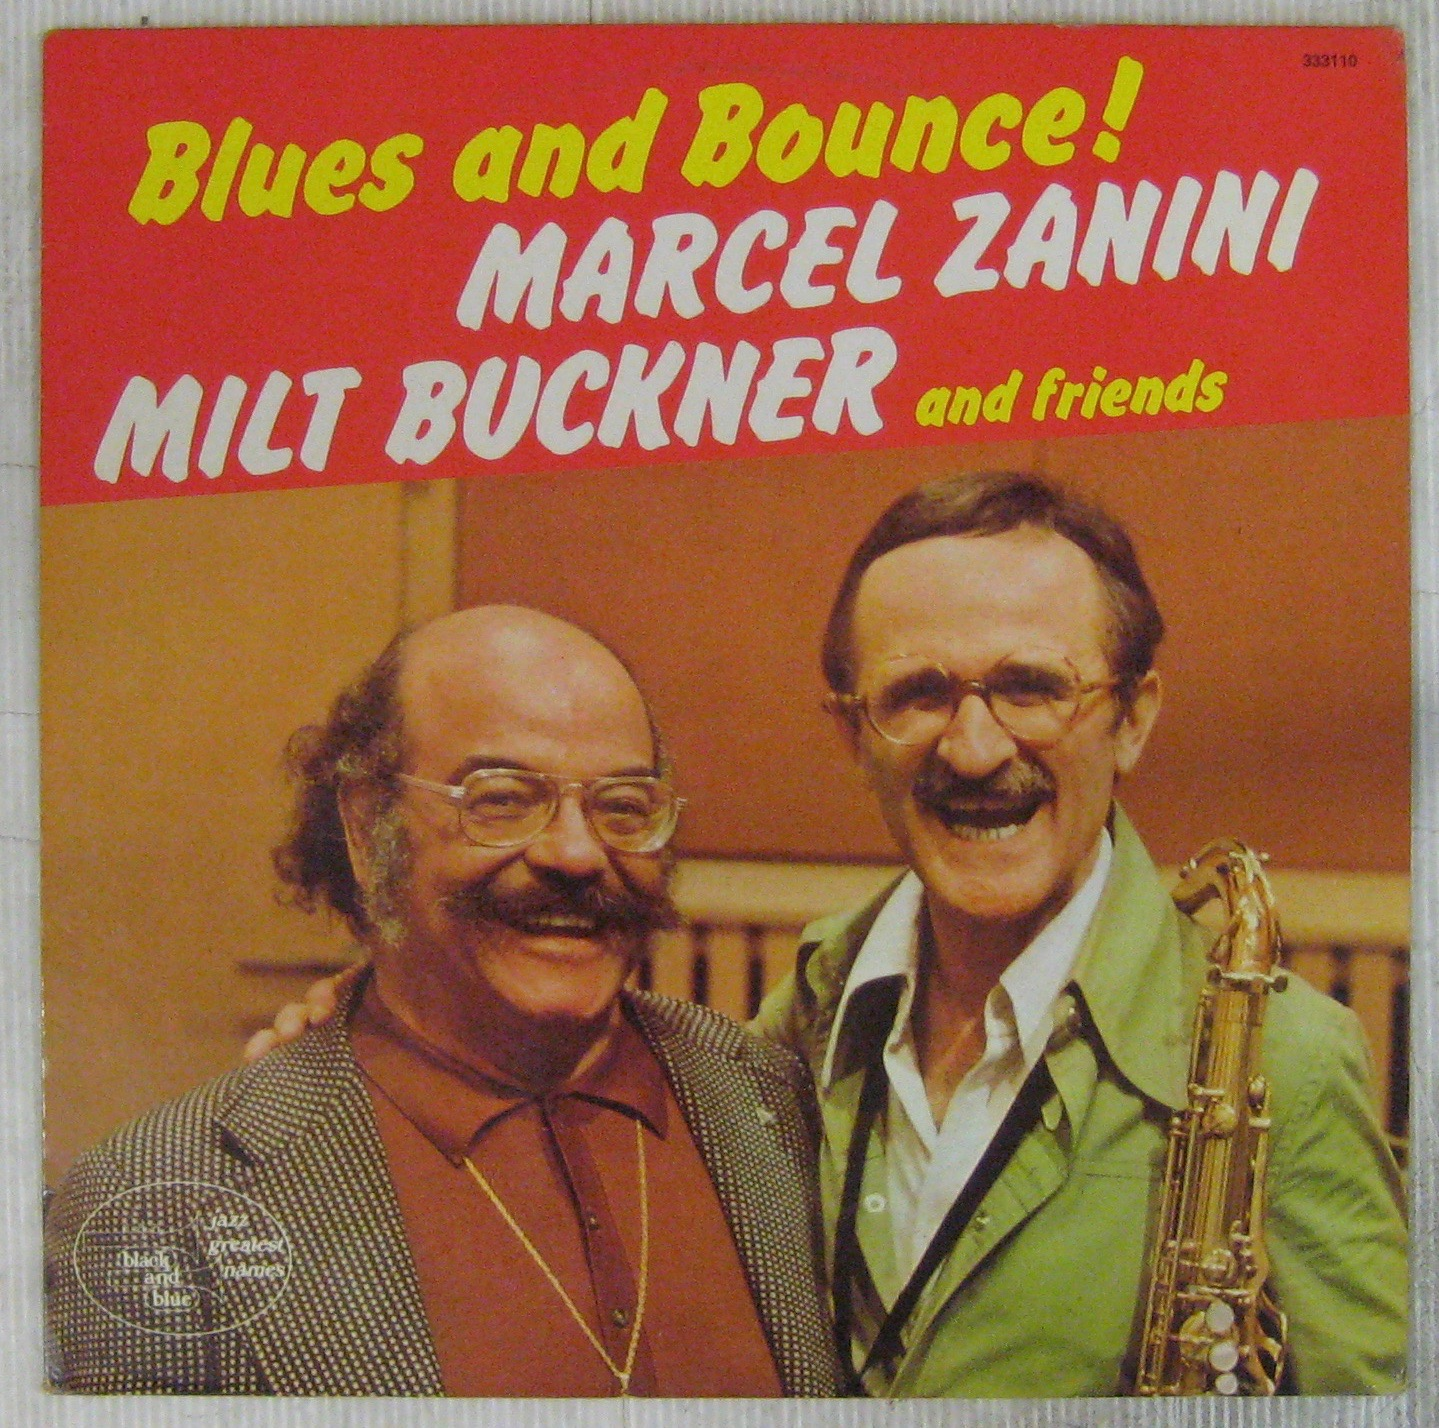 ZANINI MARCEL MILT BUCKNER AND FRIENDS - Blues and bounce ! - LP